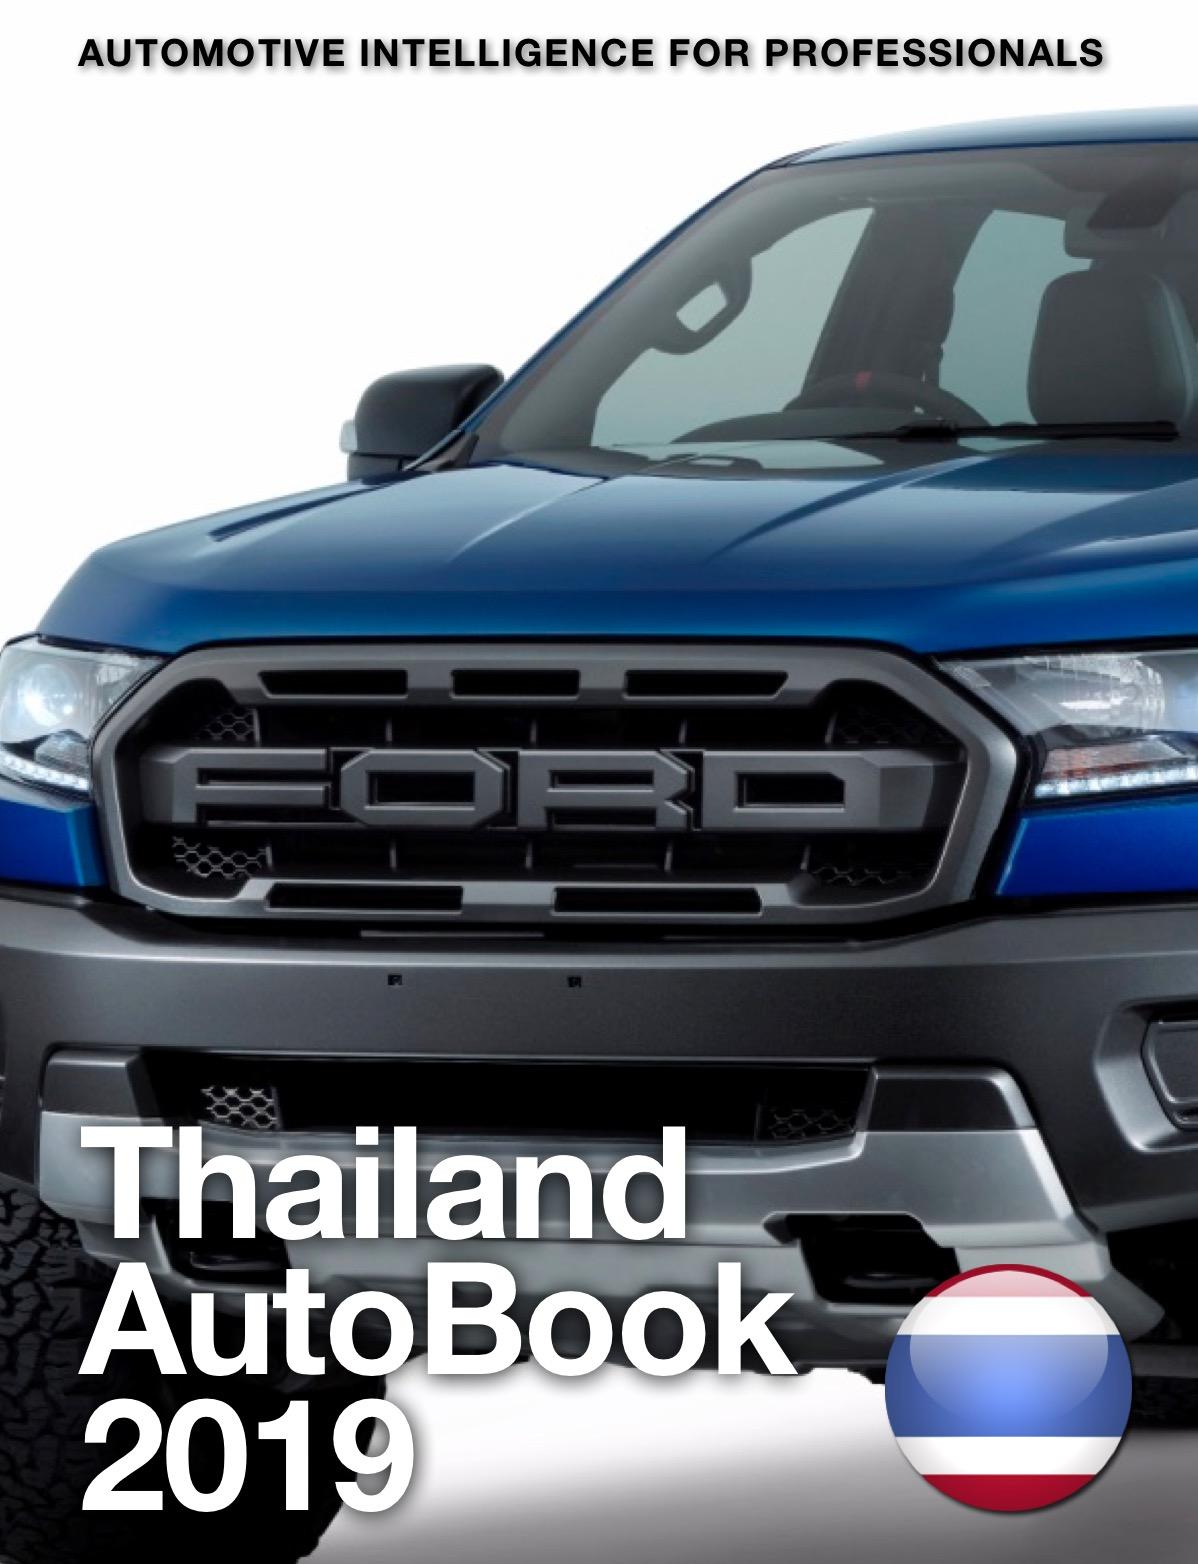 Thailand AutoBook 2019 Cover.jpg